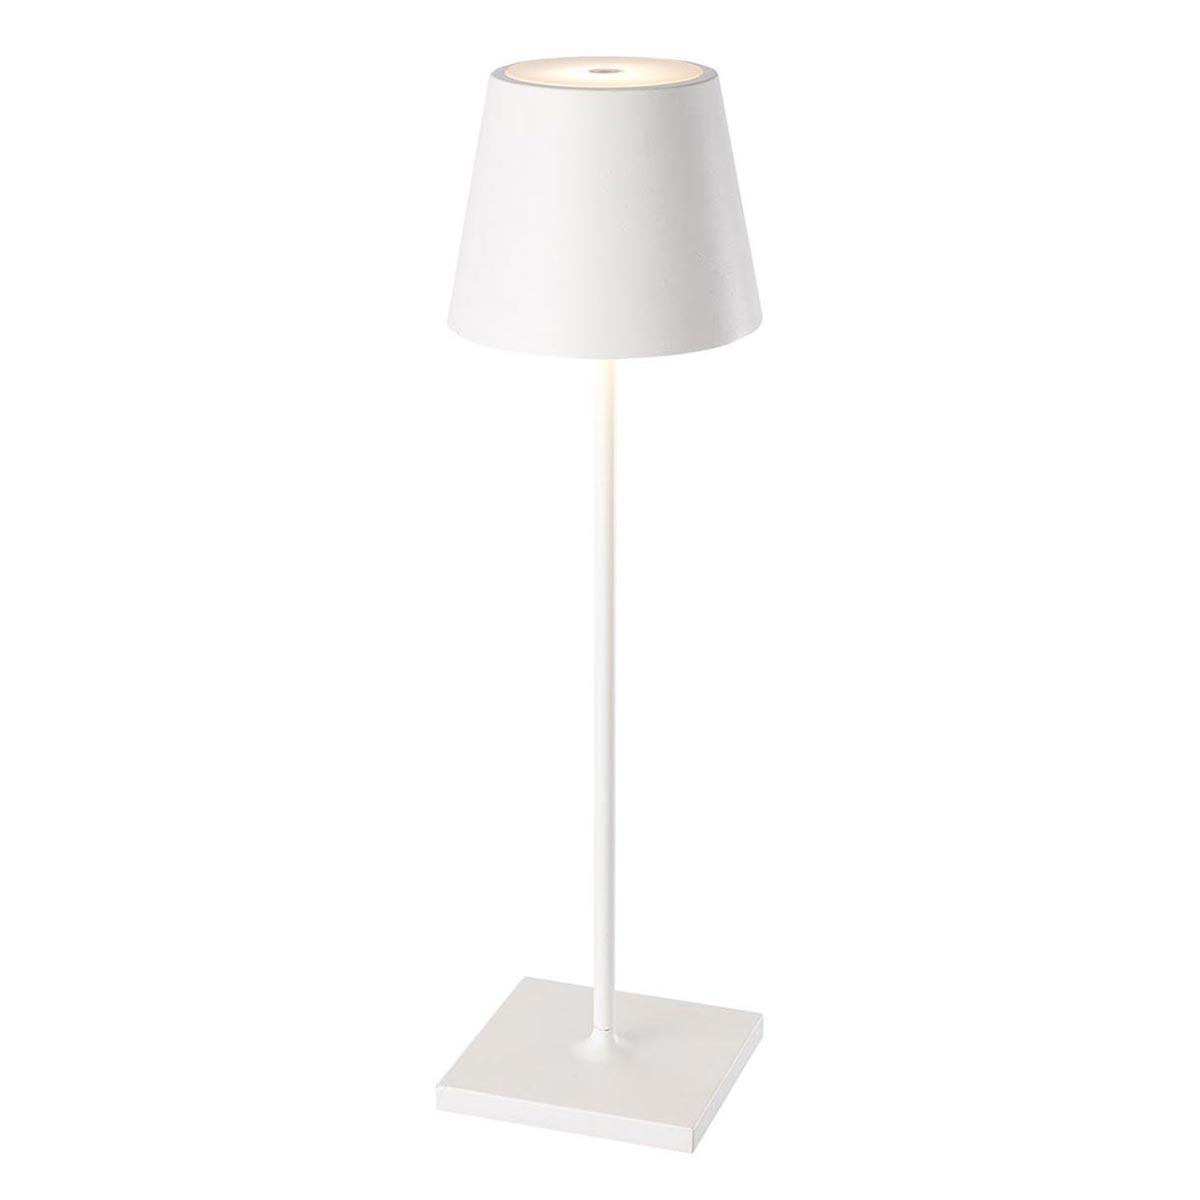 Lampe de table sans fil KELLY blanc en aluminium 39cm